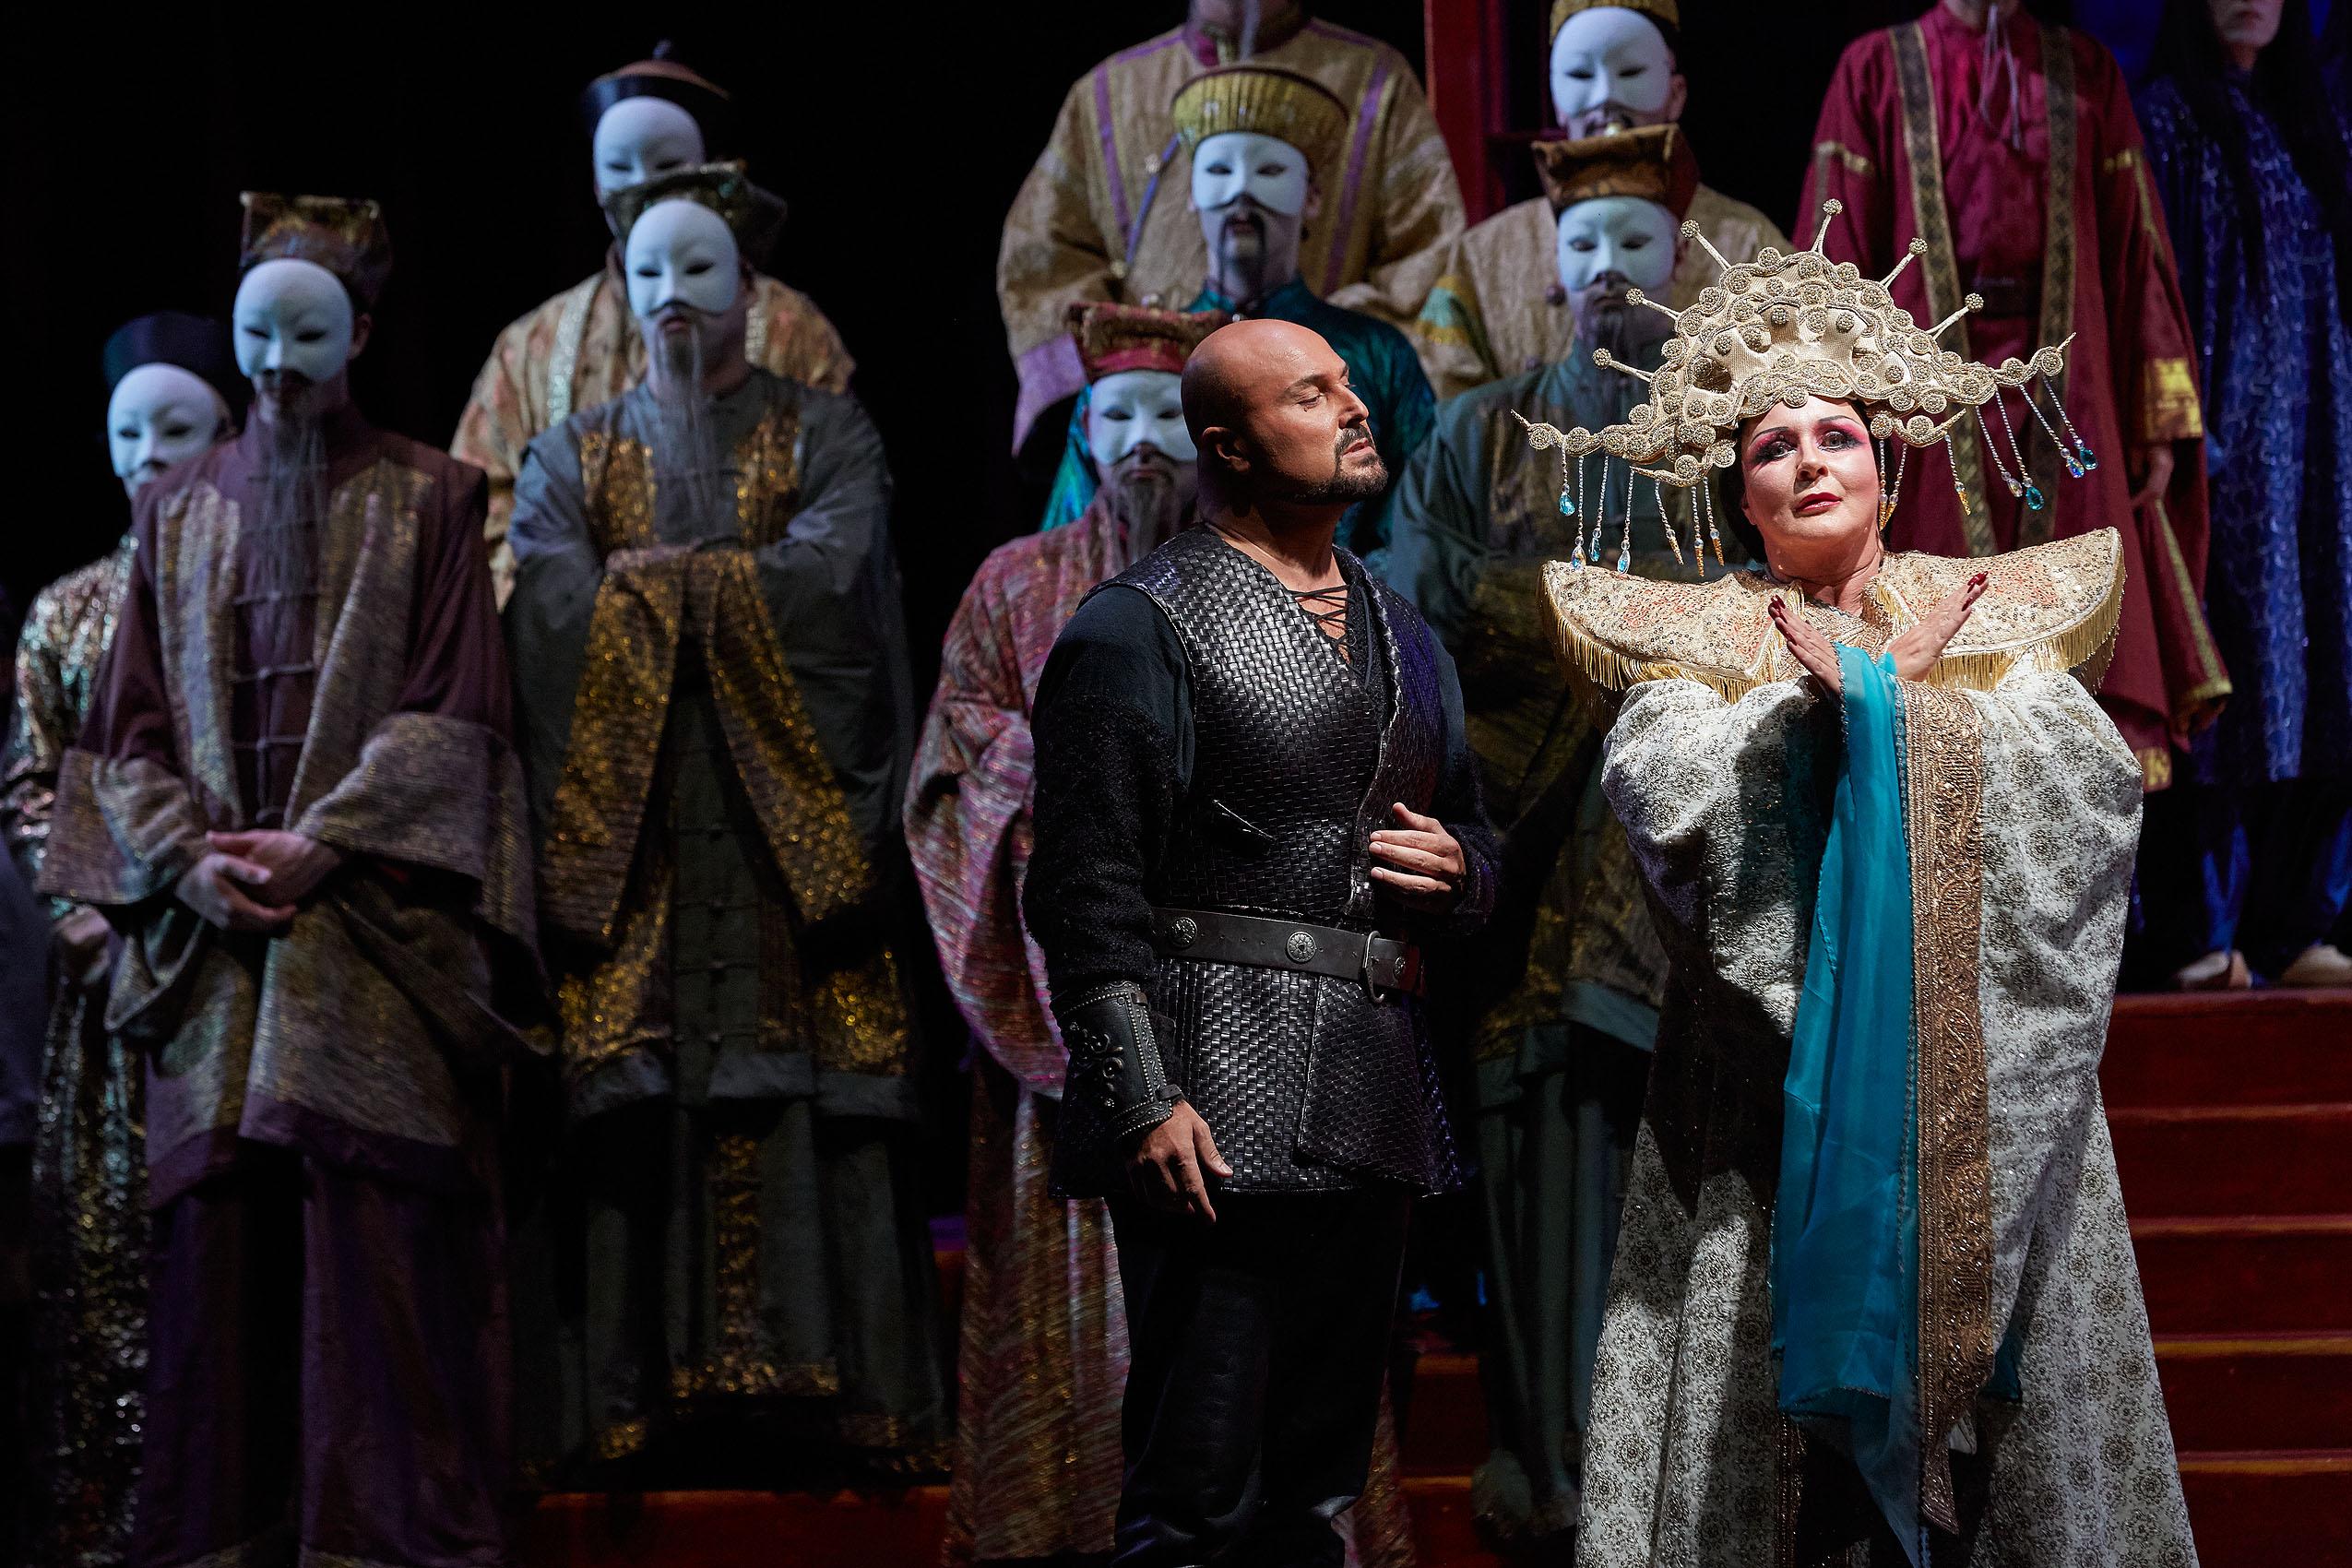 Irene Theorin triunfa como Turandot en Peralada. Foto: Toti Ferrer